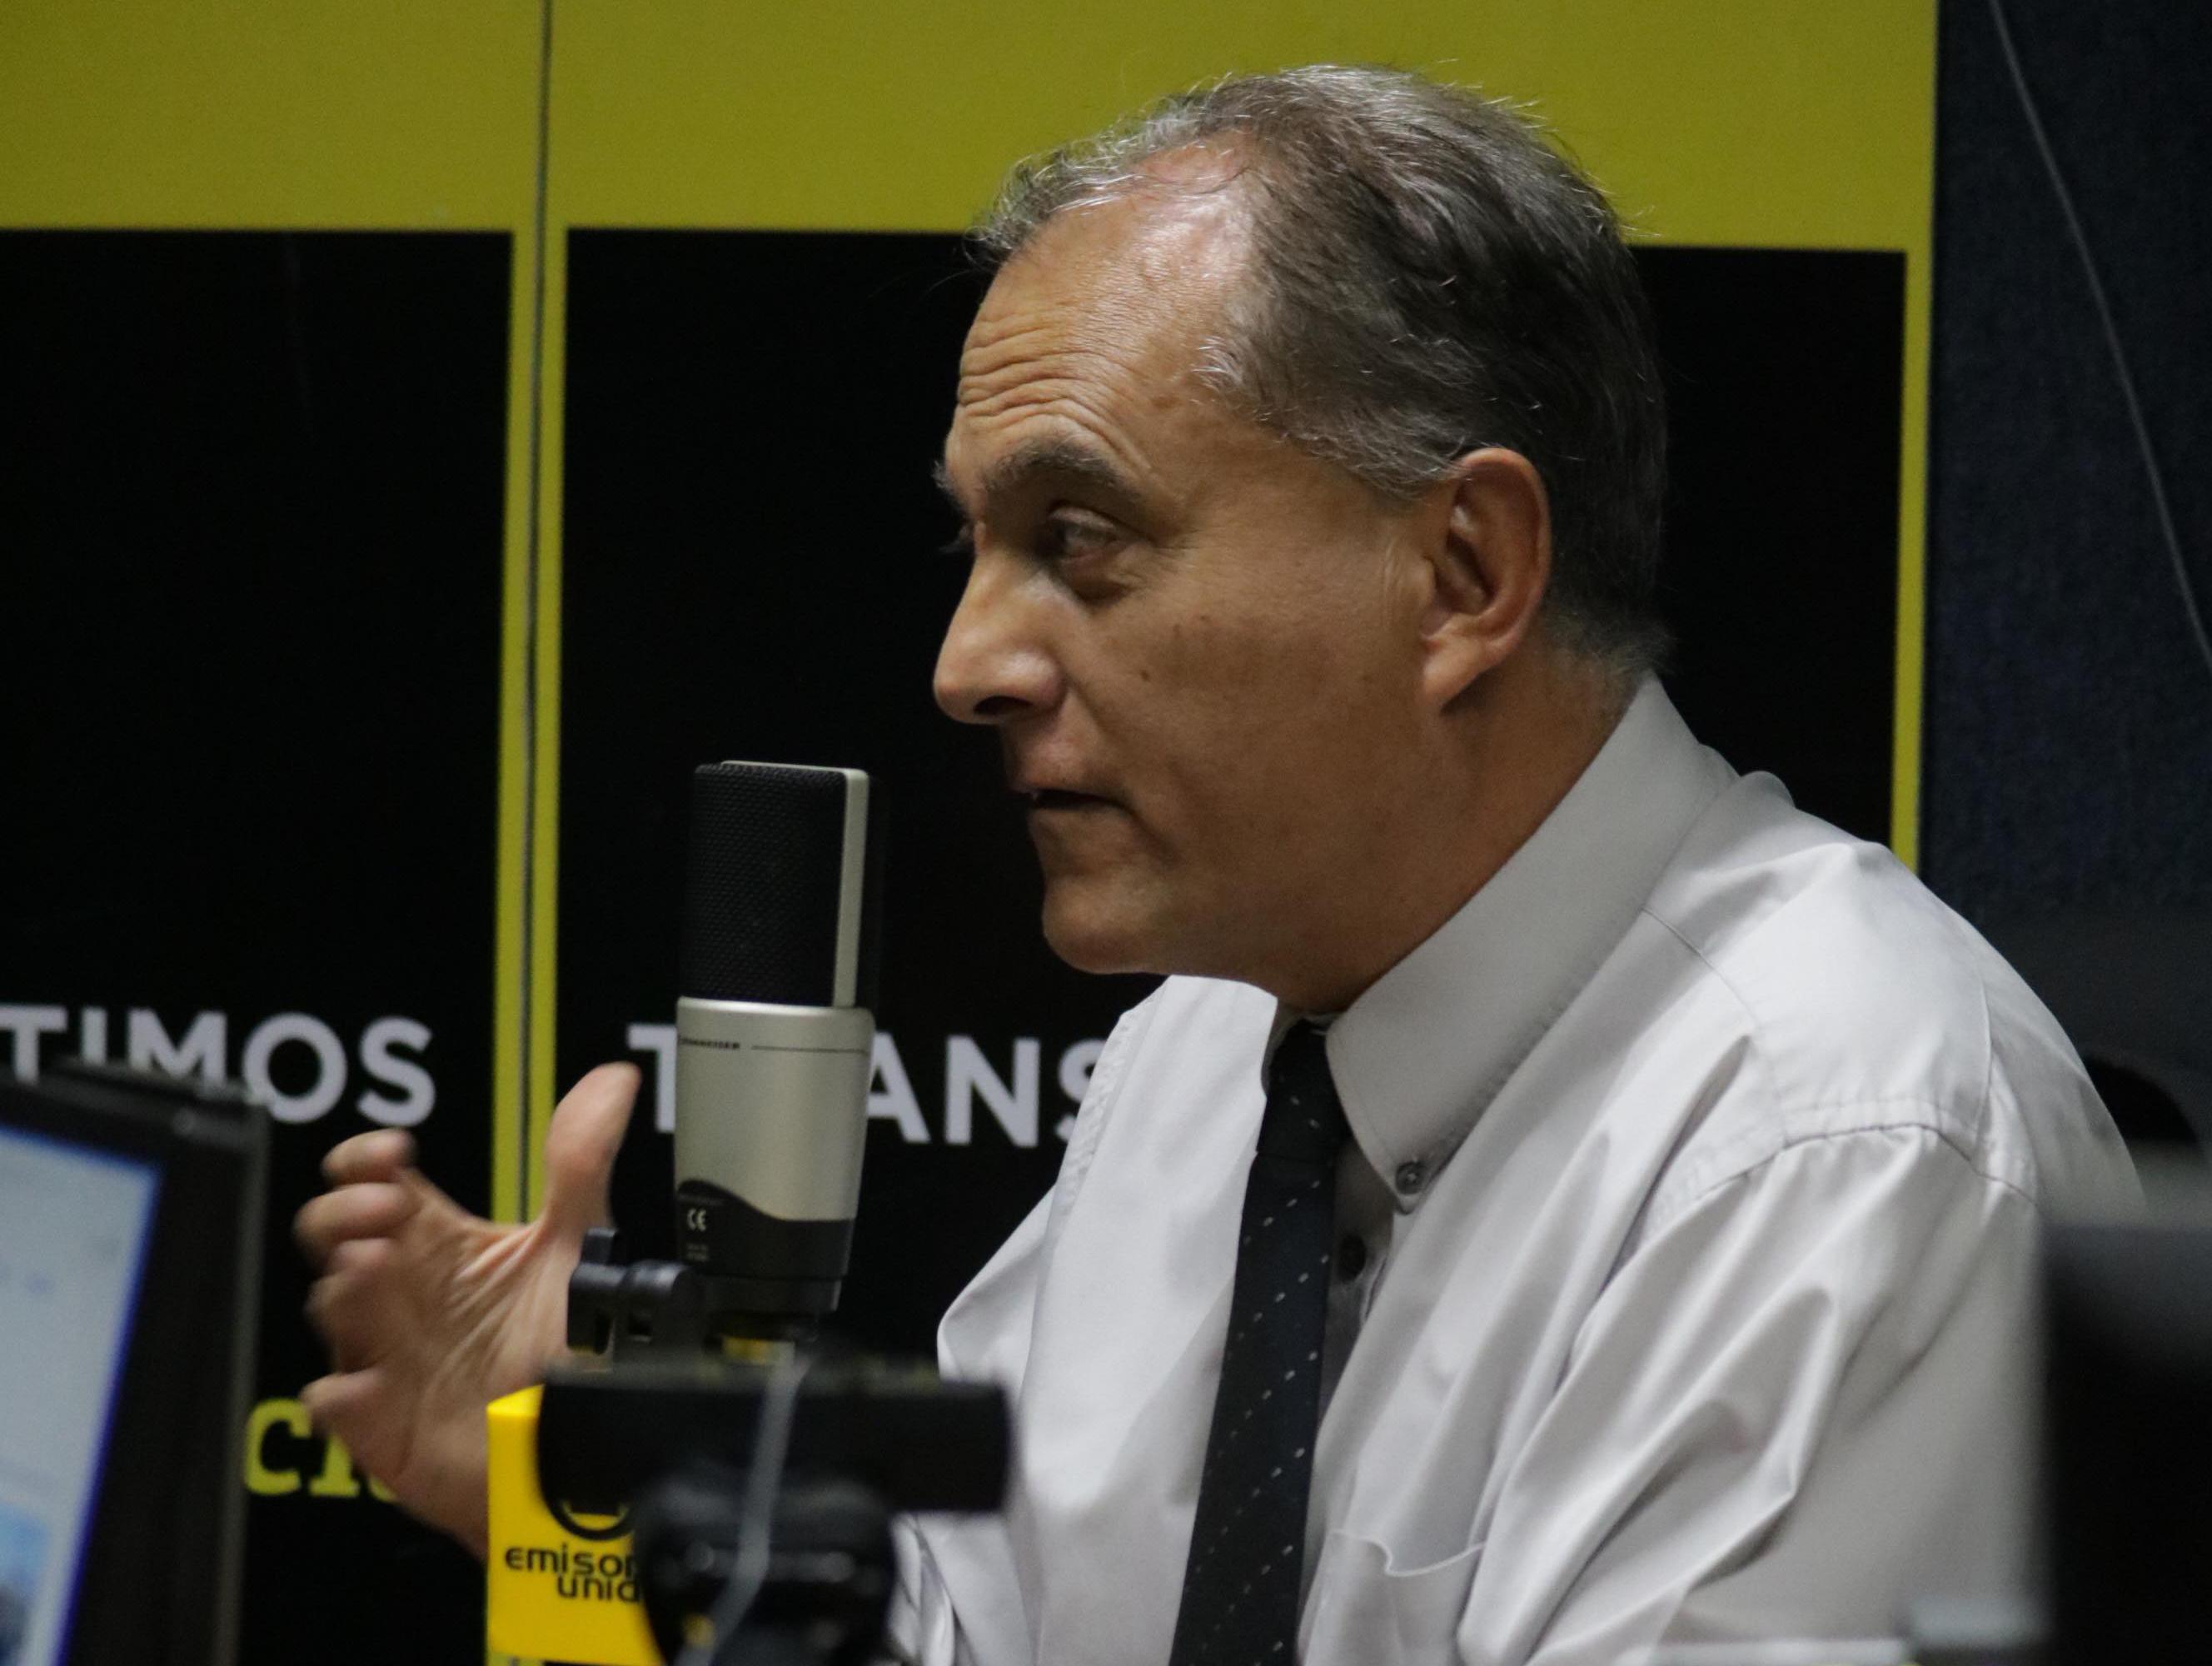 Manuel Villacorta, candidato a la presidencia de Winaq. Foto: Alejandro Chet.